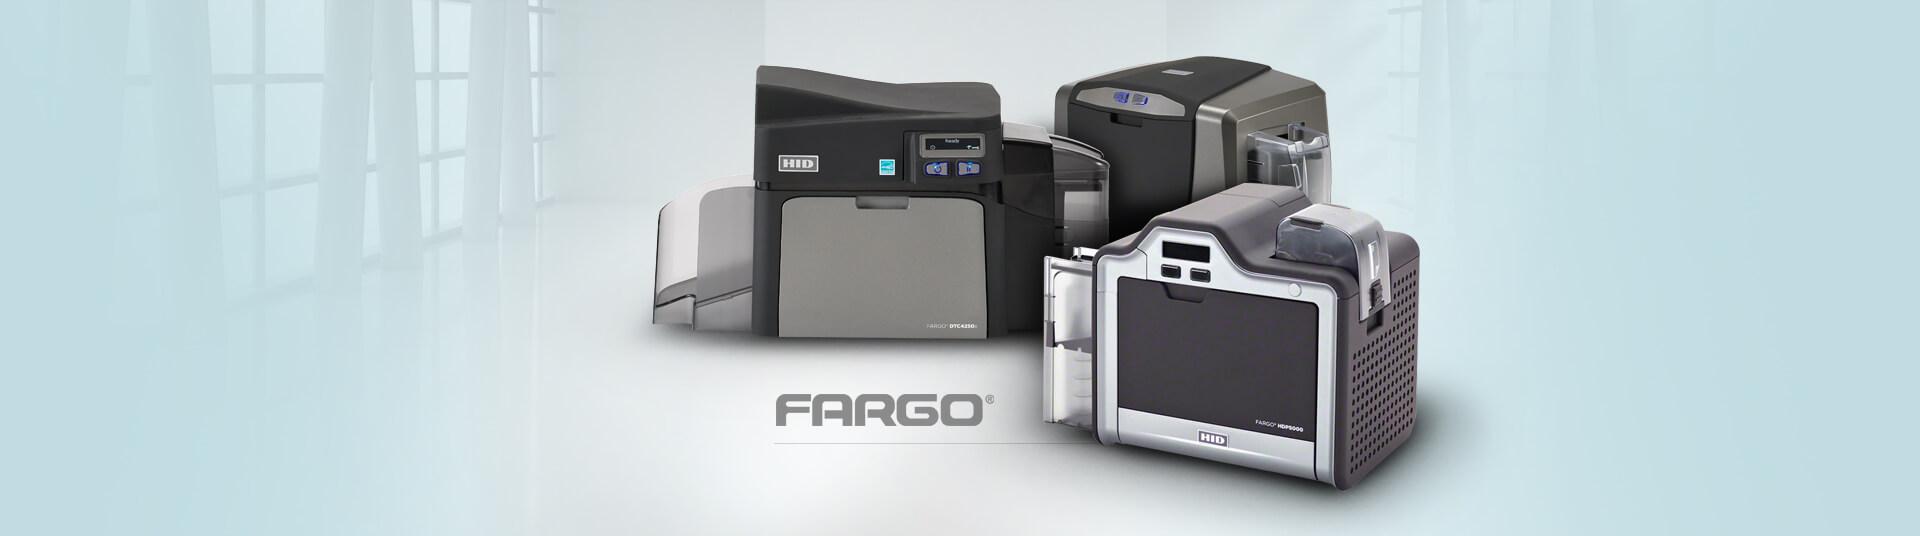 Fargo Photo ID Printers